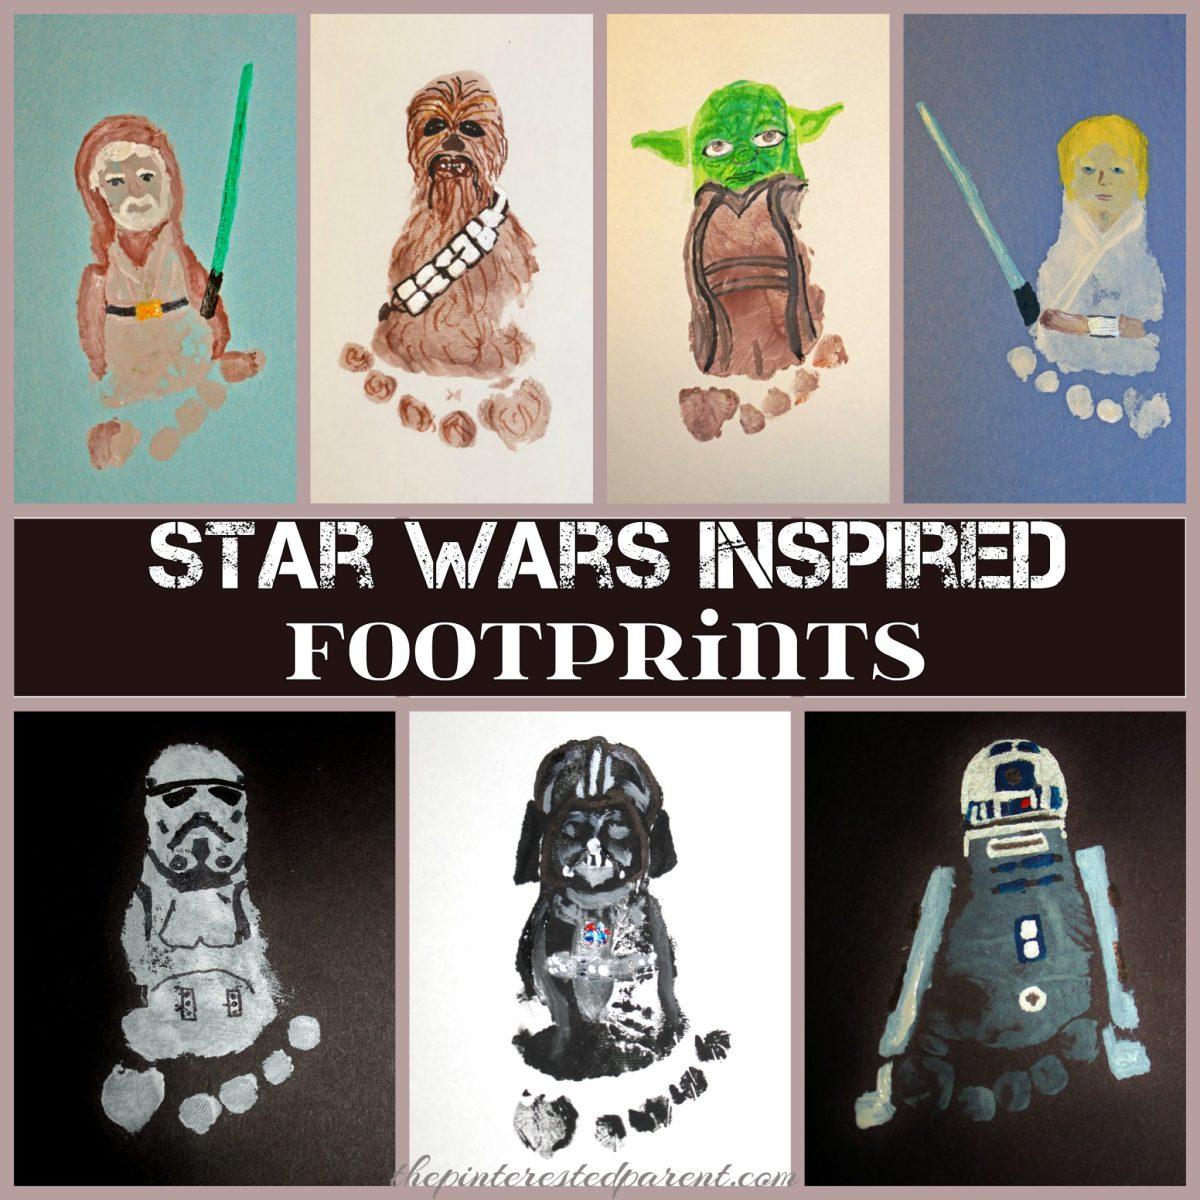 Star Wars Inspired Footprints